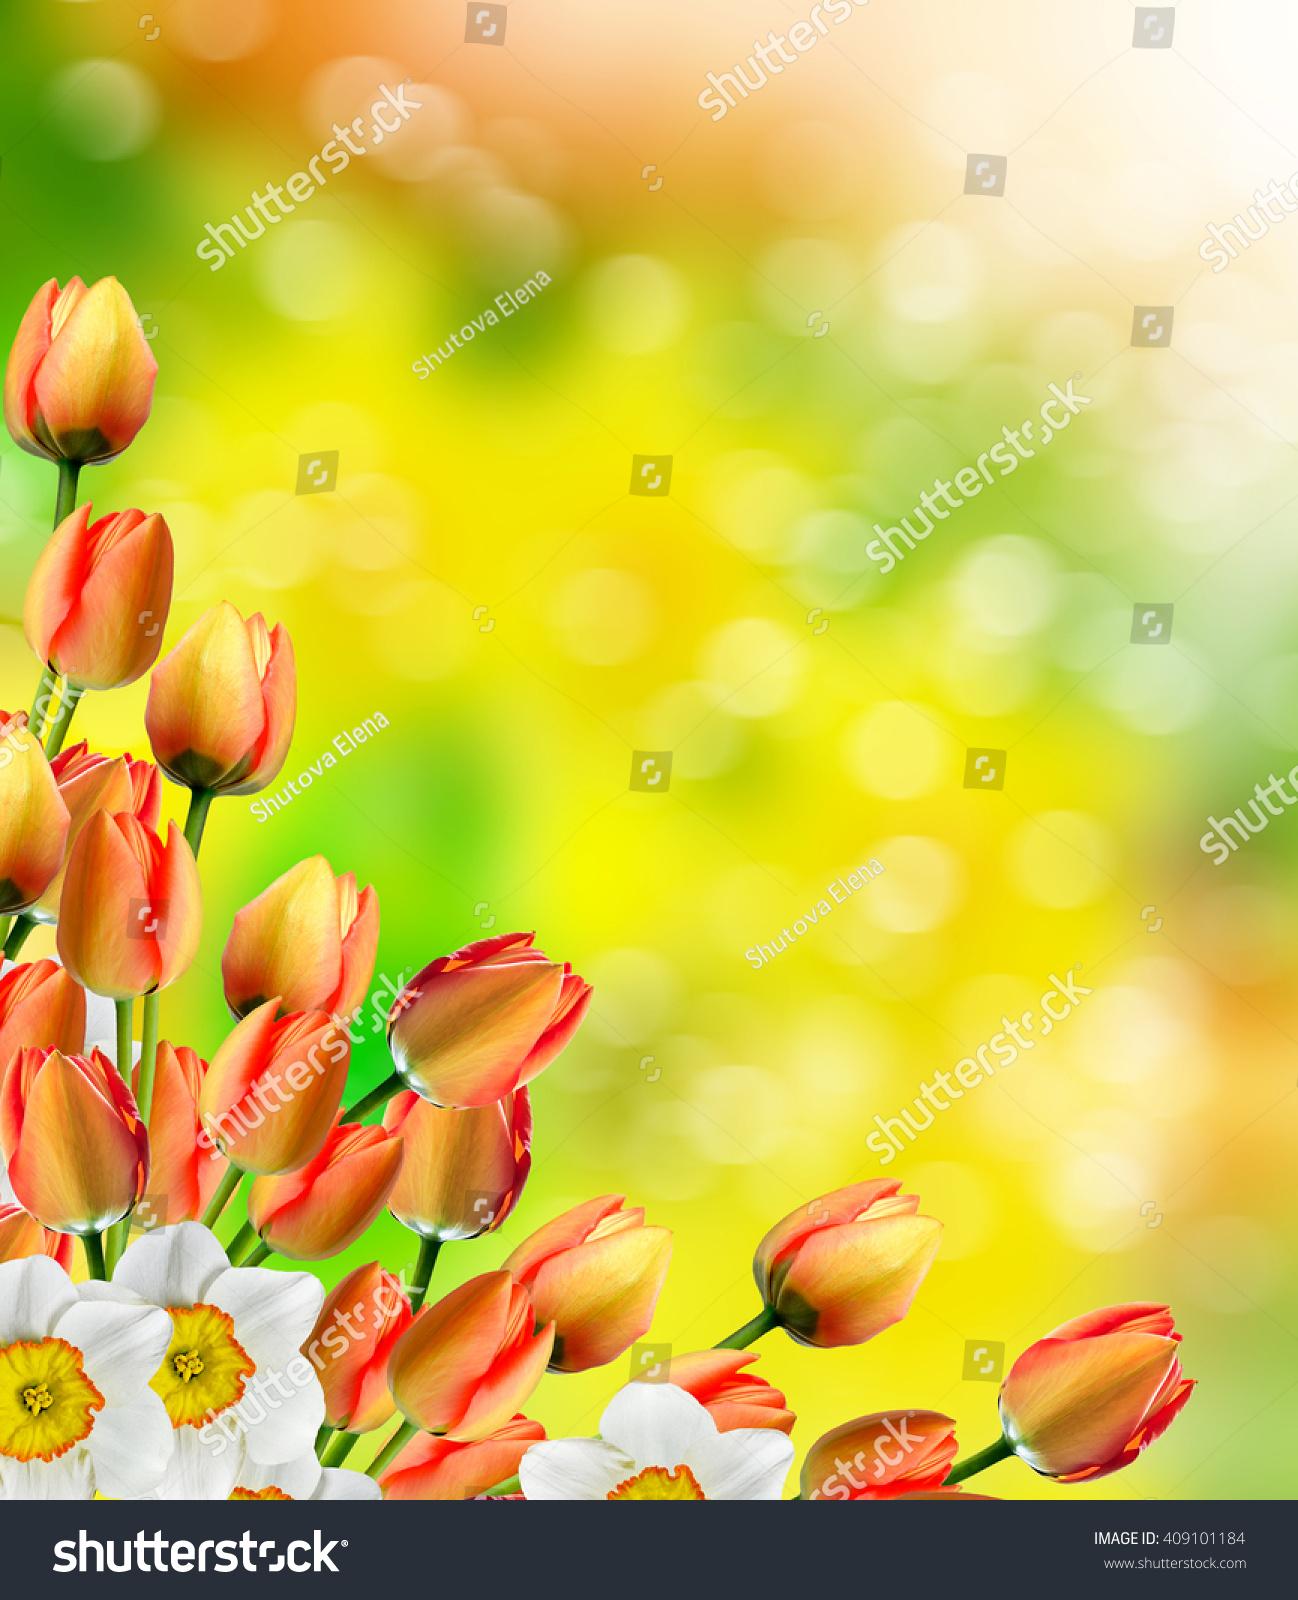 Spring Landscape Beautiful Spring Flowers Daffodils Stockfoto Jetzt